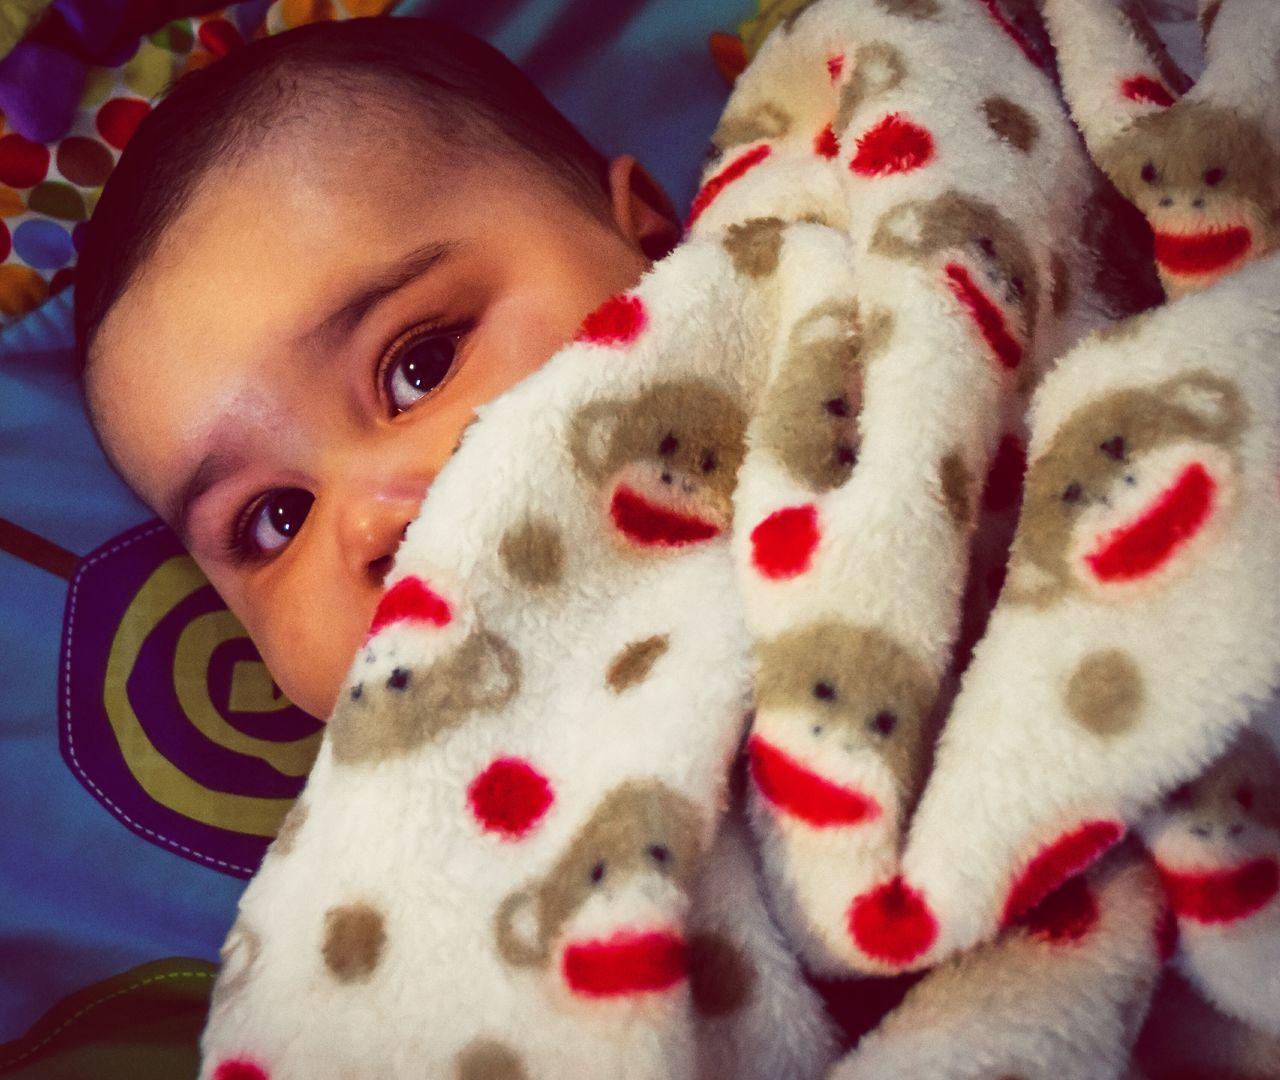 Peek-a-boo! My Favorite Photo MyBabyBoy Cute Baby Eyeembaby Babyboy Cutestbabyever Cutekidsclub Hello World Baby Boy Babylove Cute Kid Cutekids Babymodel Adorable EyeEm Best Shots Eye Em Babies Instababy Babies Of Eyeem Babiesofinstagram Followme Baby Portrait My Baby Boy Adorable Baby Eye Em Best Shots Baby Photography